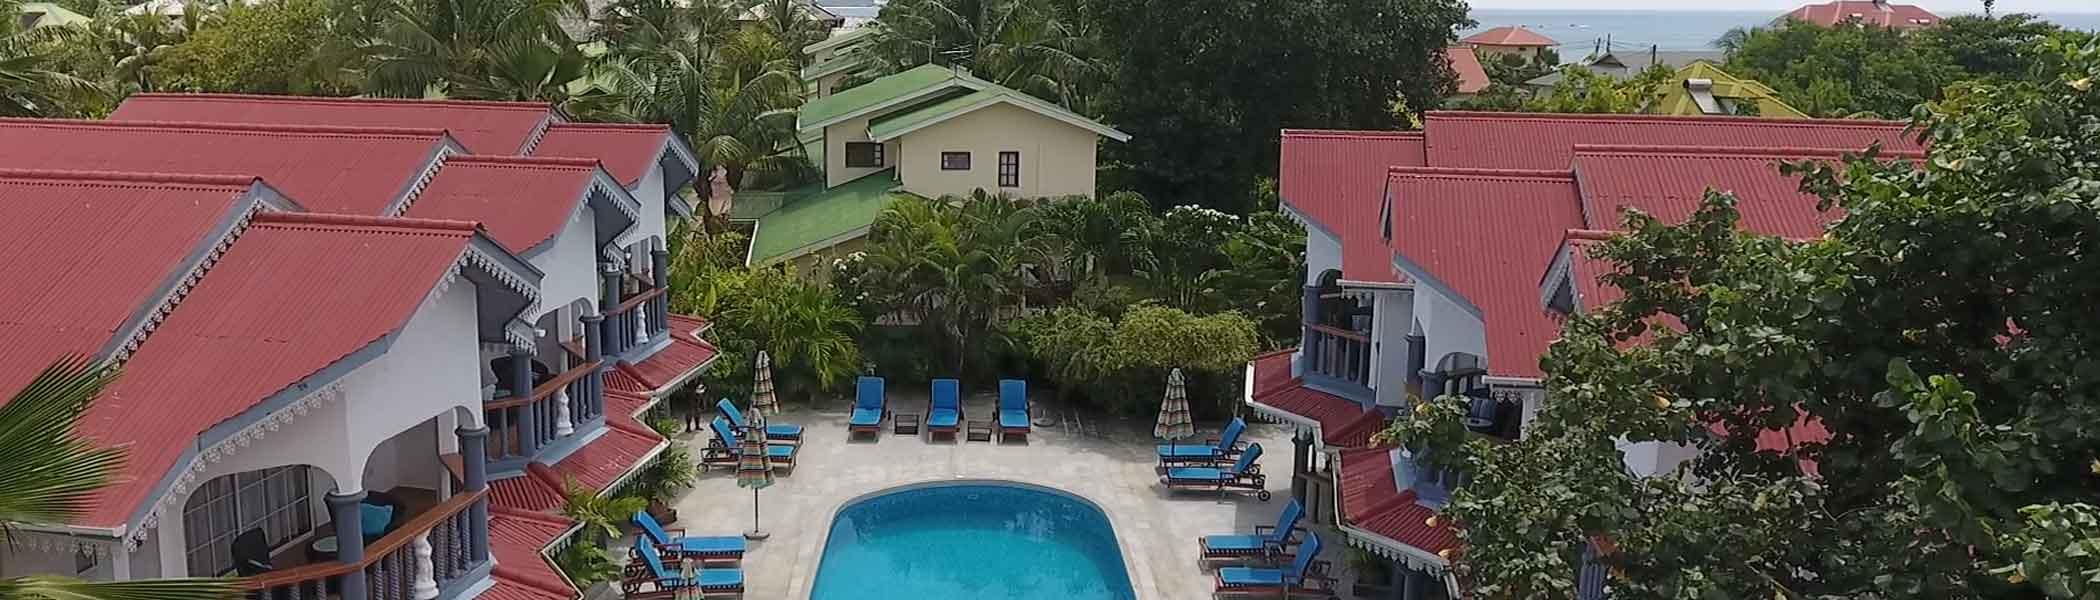 chateau-sans-souci, Hotels in Seychelles Islands